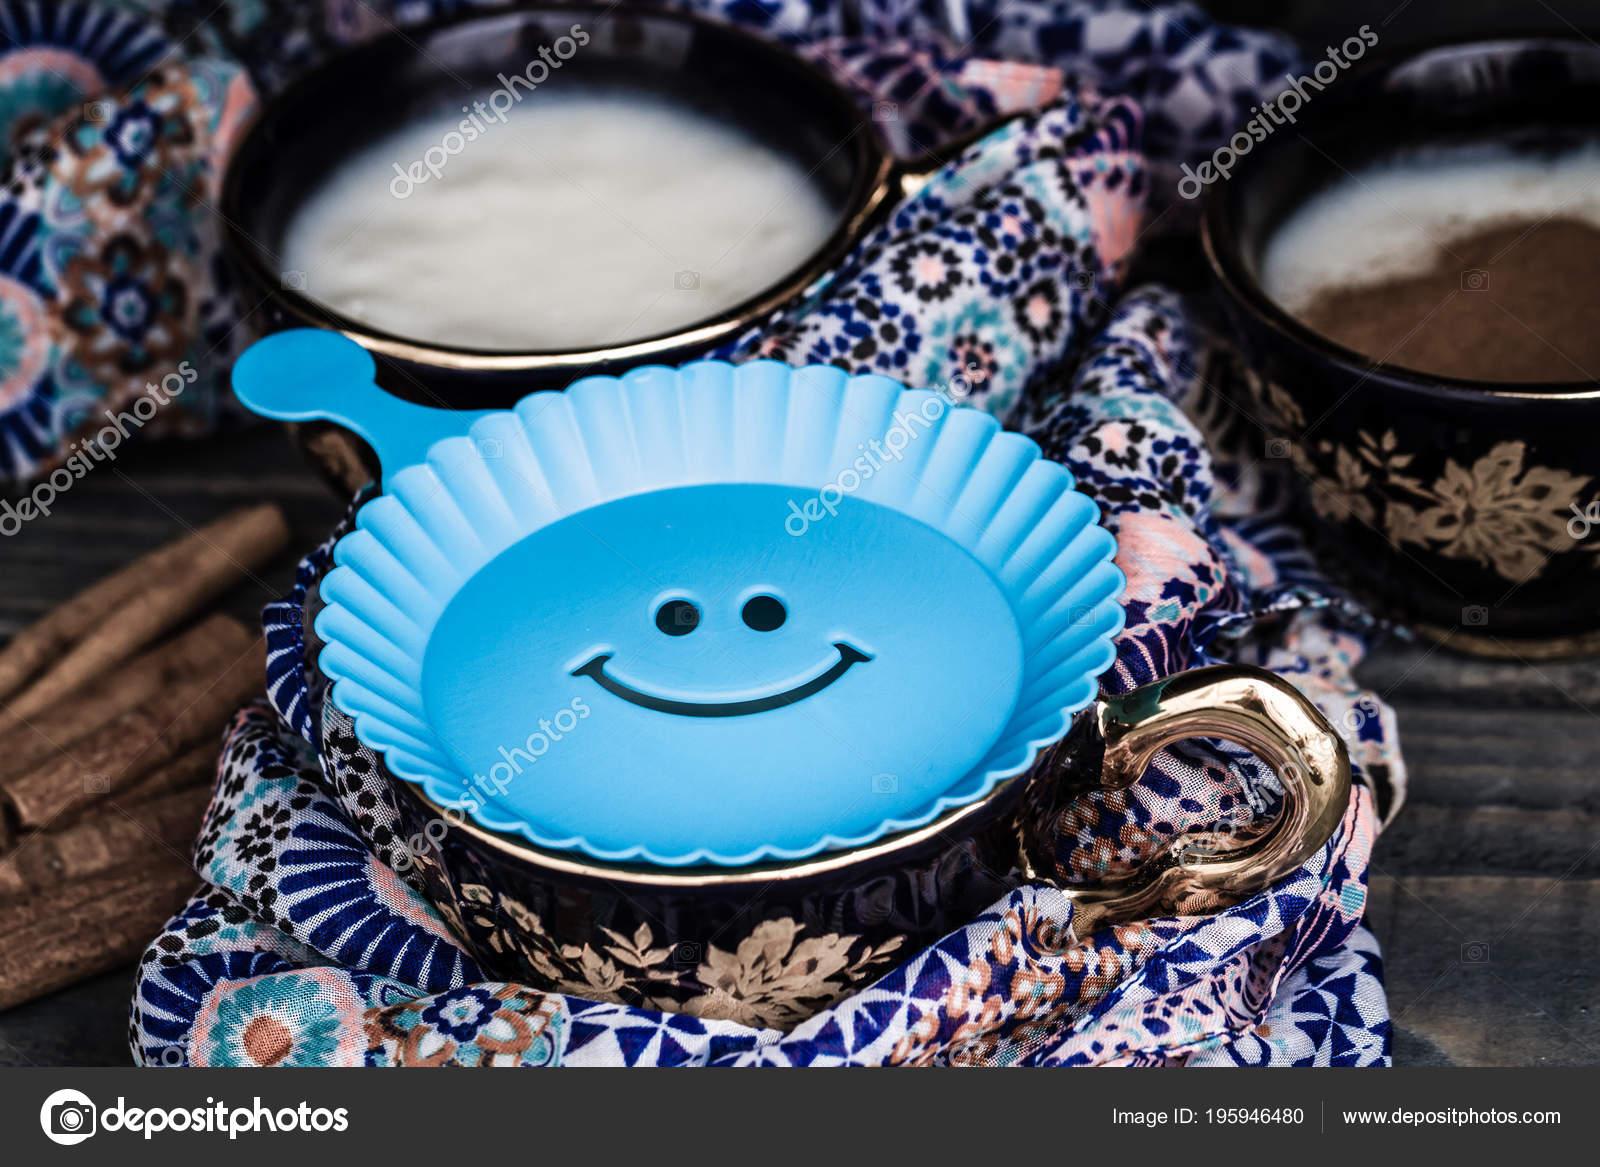 plastic smiley face template put powder cinnemon sahlep stock